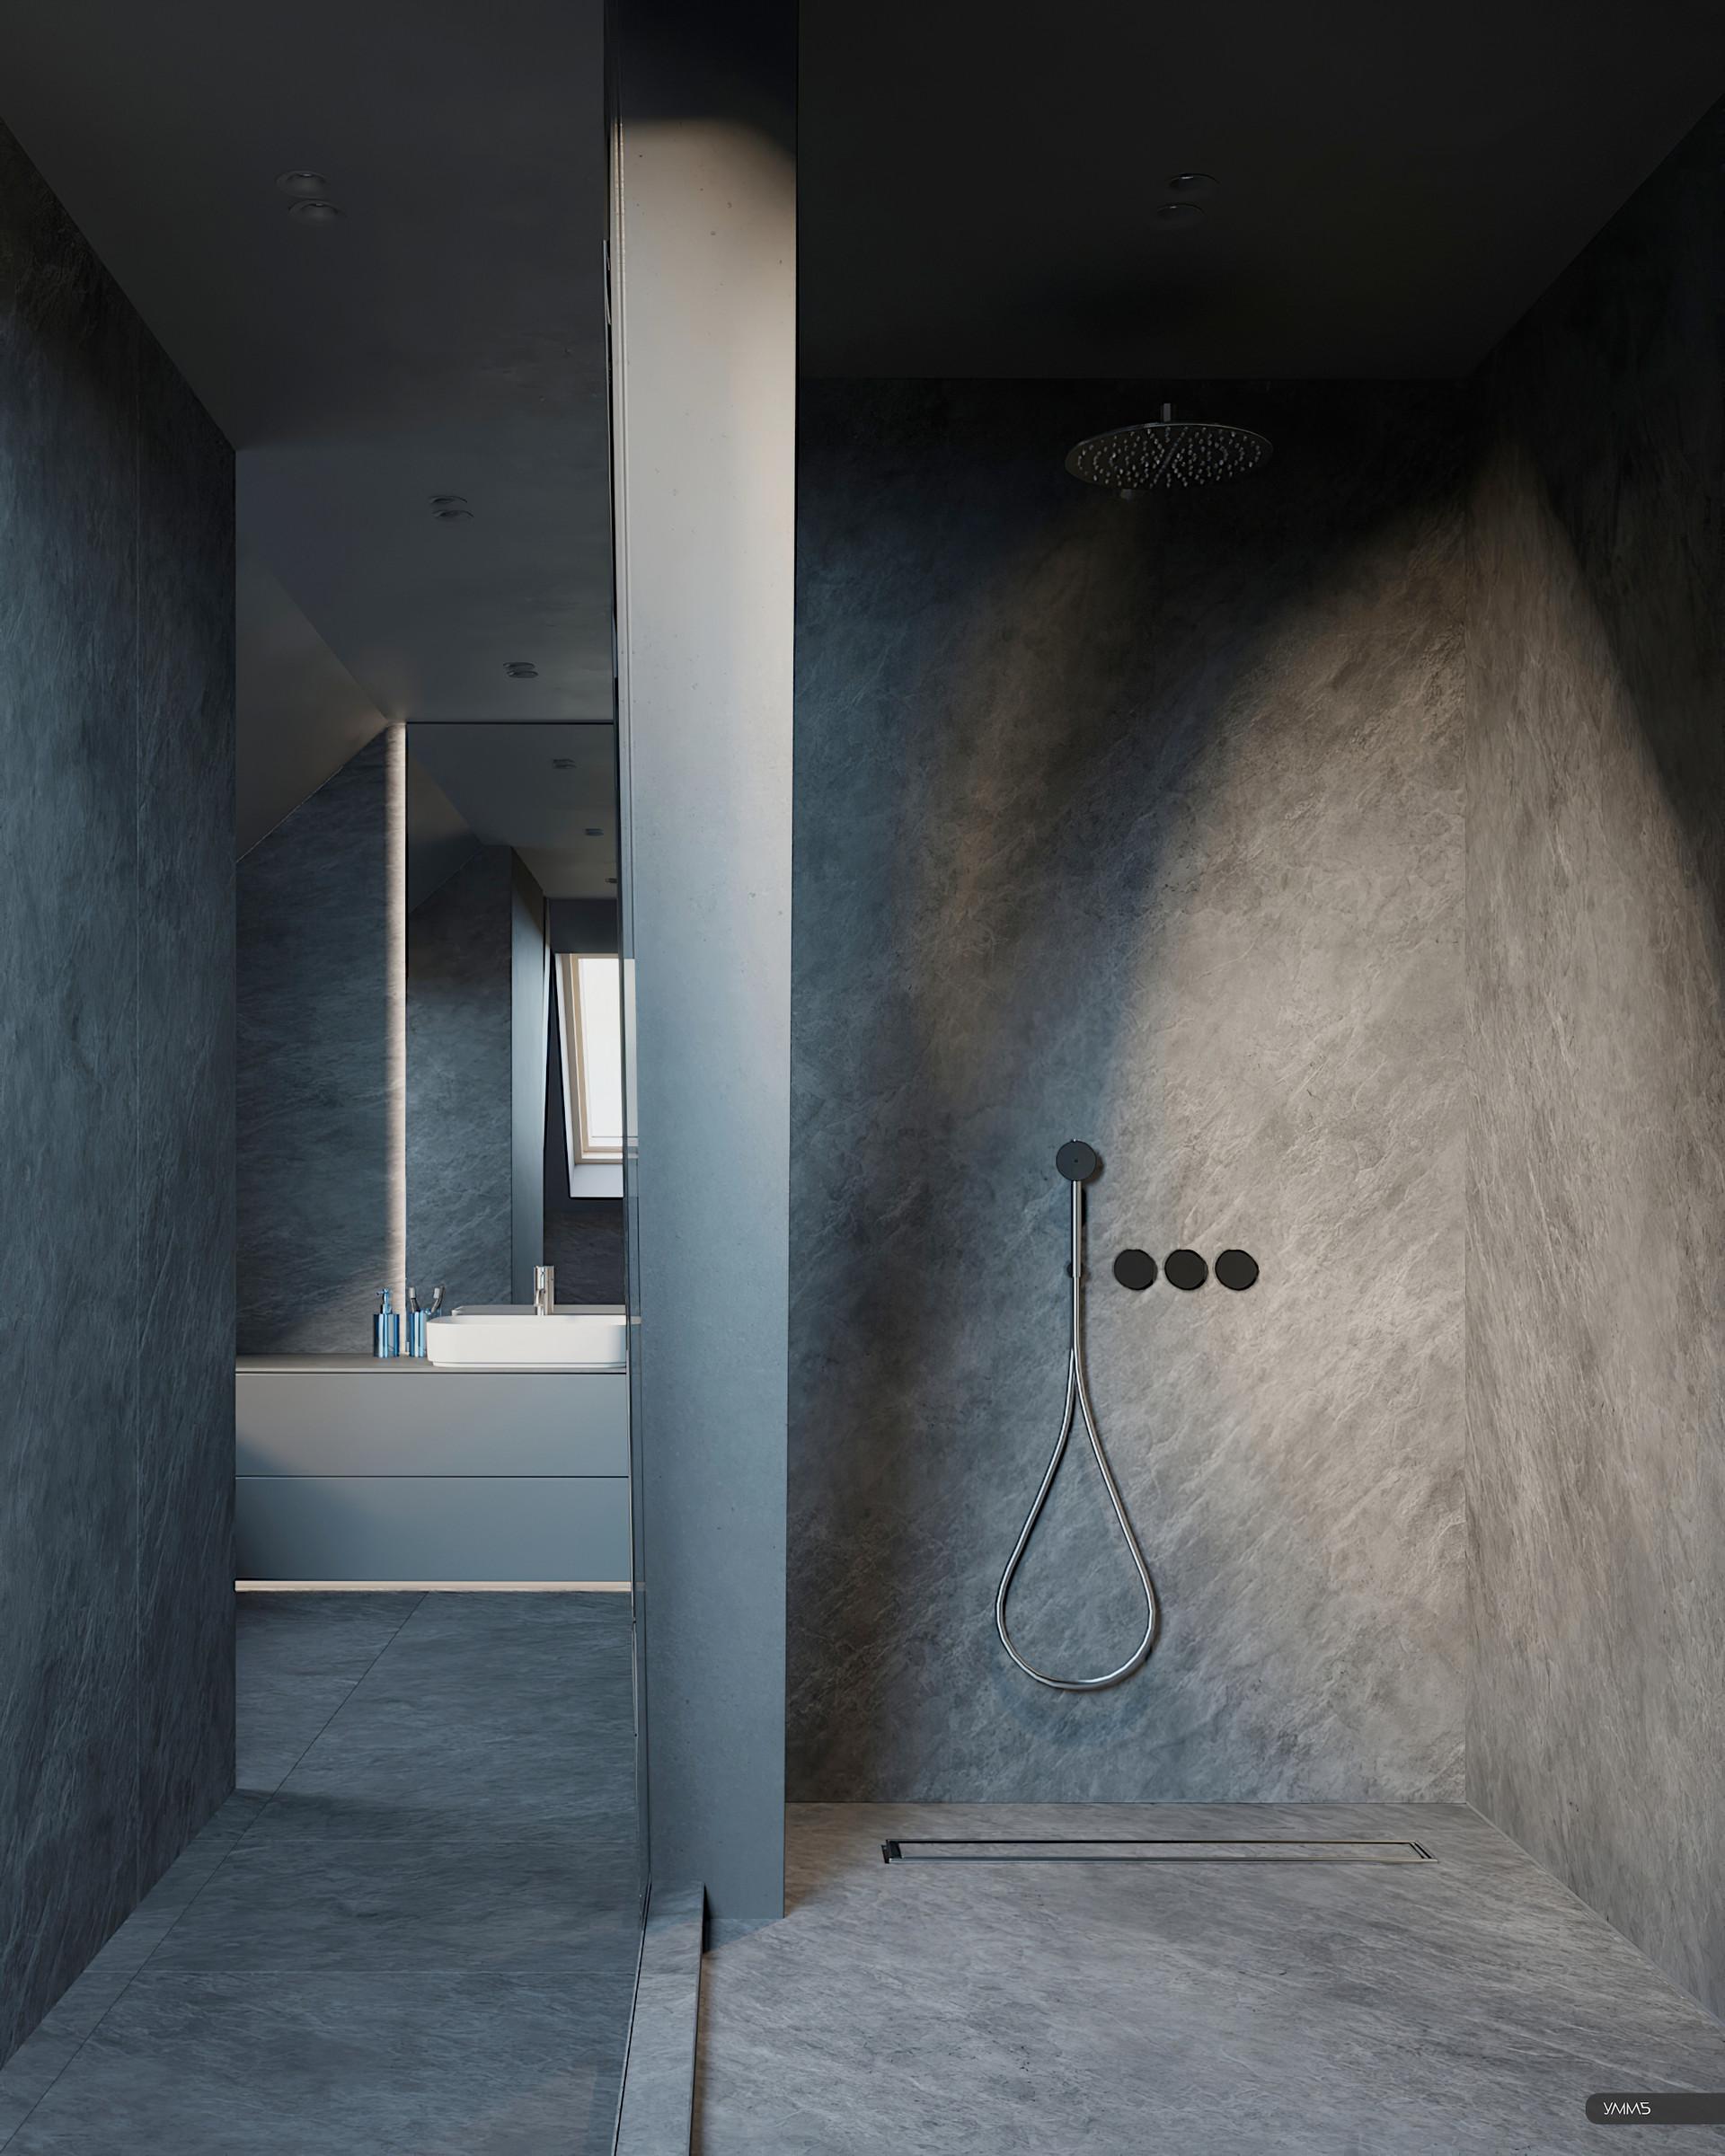 Ванная комната, дизайн ванной комнаты, интерьер ванной комнаты, современный интерьер ванной комнаты, современный дизайн ванной комнаты, современный интерьер, дизайн интерьера, дизайн, интерьер, дизайн интерьера калининград, калининград, умм5, umm5, modern interior, modern bathroom, design interior, interior design, светлогорск, светлая ванная, светлый дизайн ванной комнаты